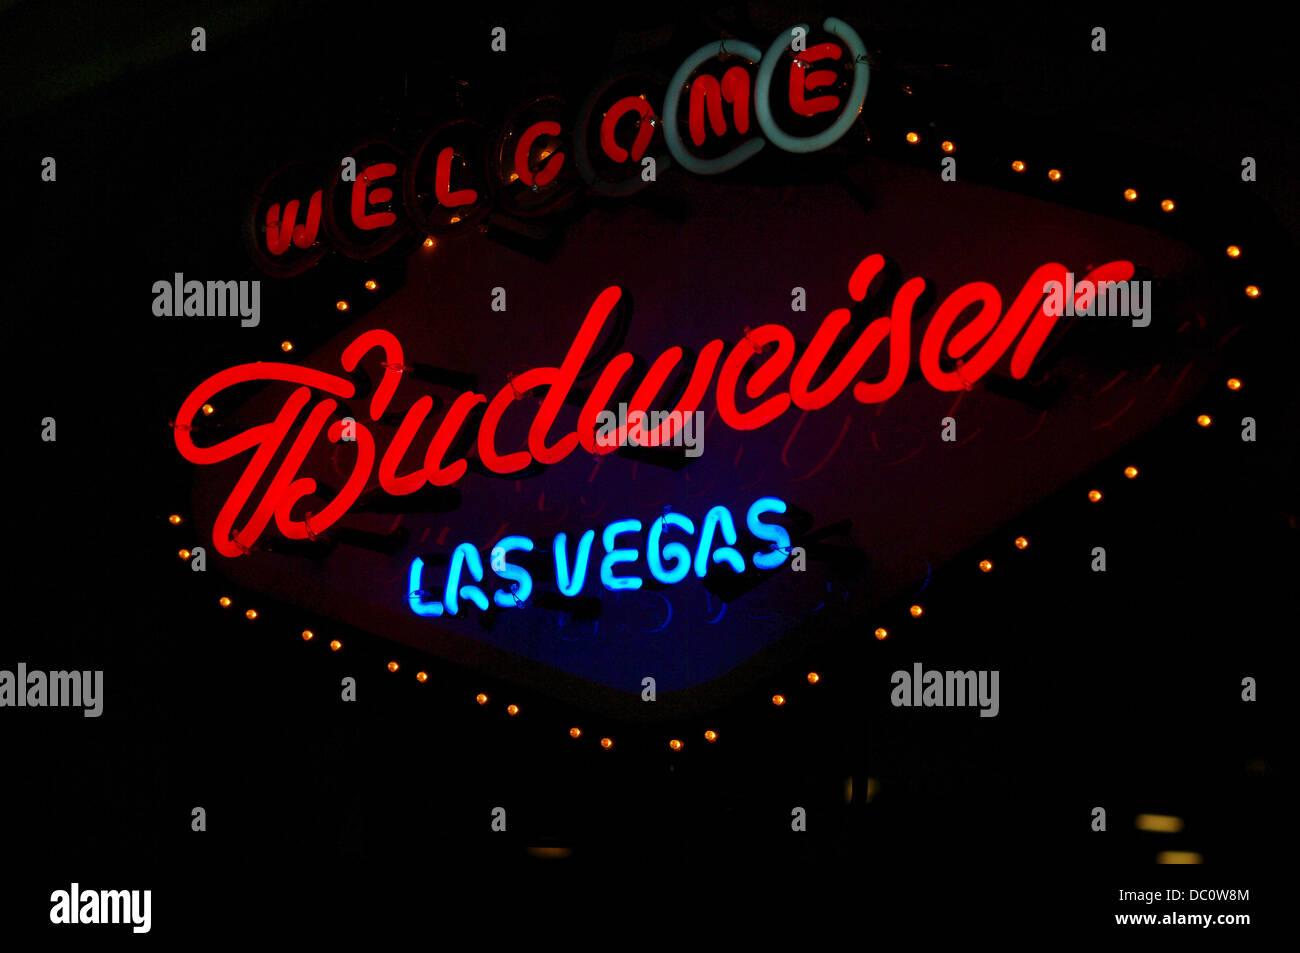 Budweiser neon advertising sign in Las Vegas Stock Photo